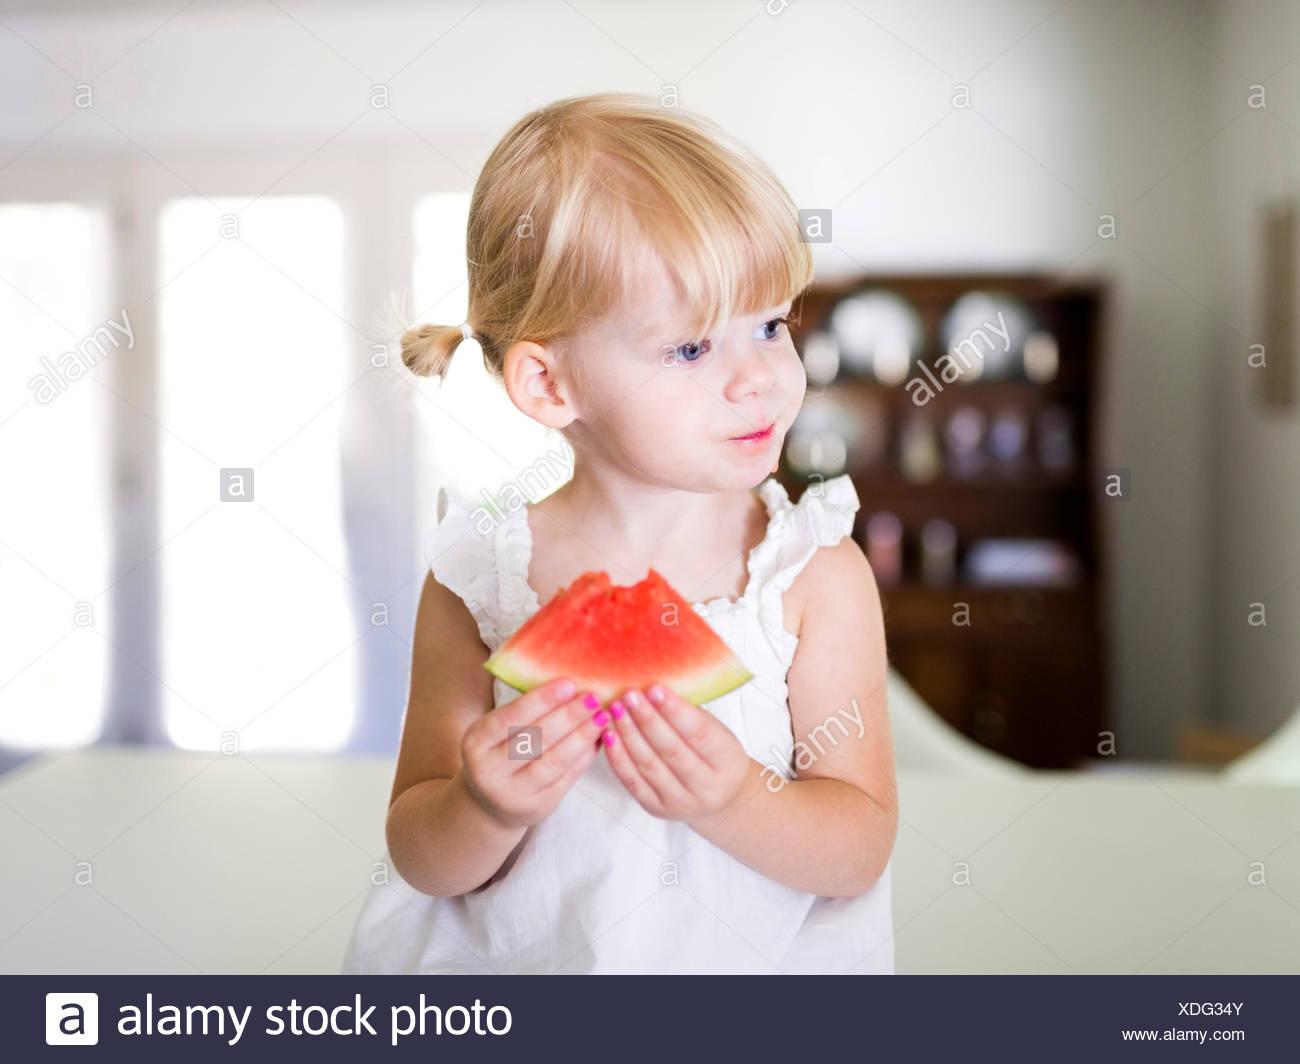 Portrait of girl (2-3) eating watermelon - Stock Image